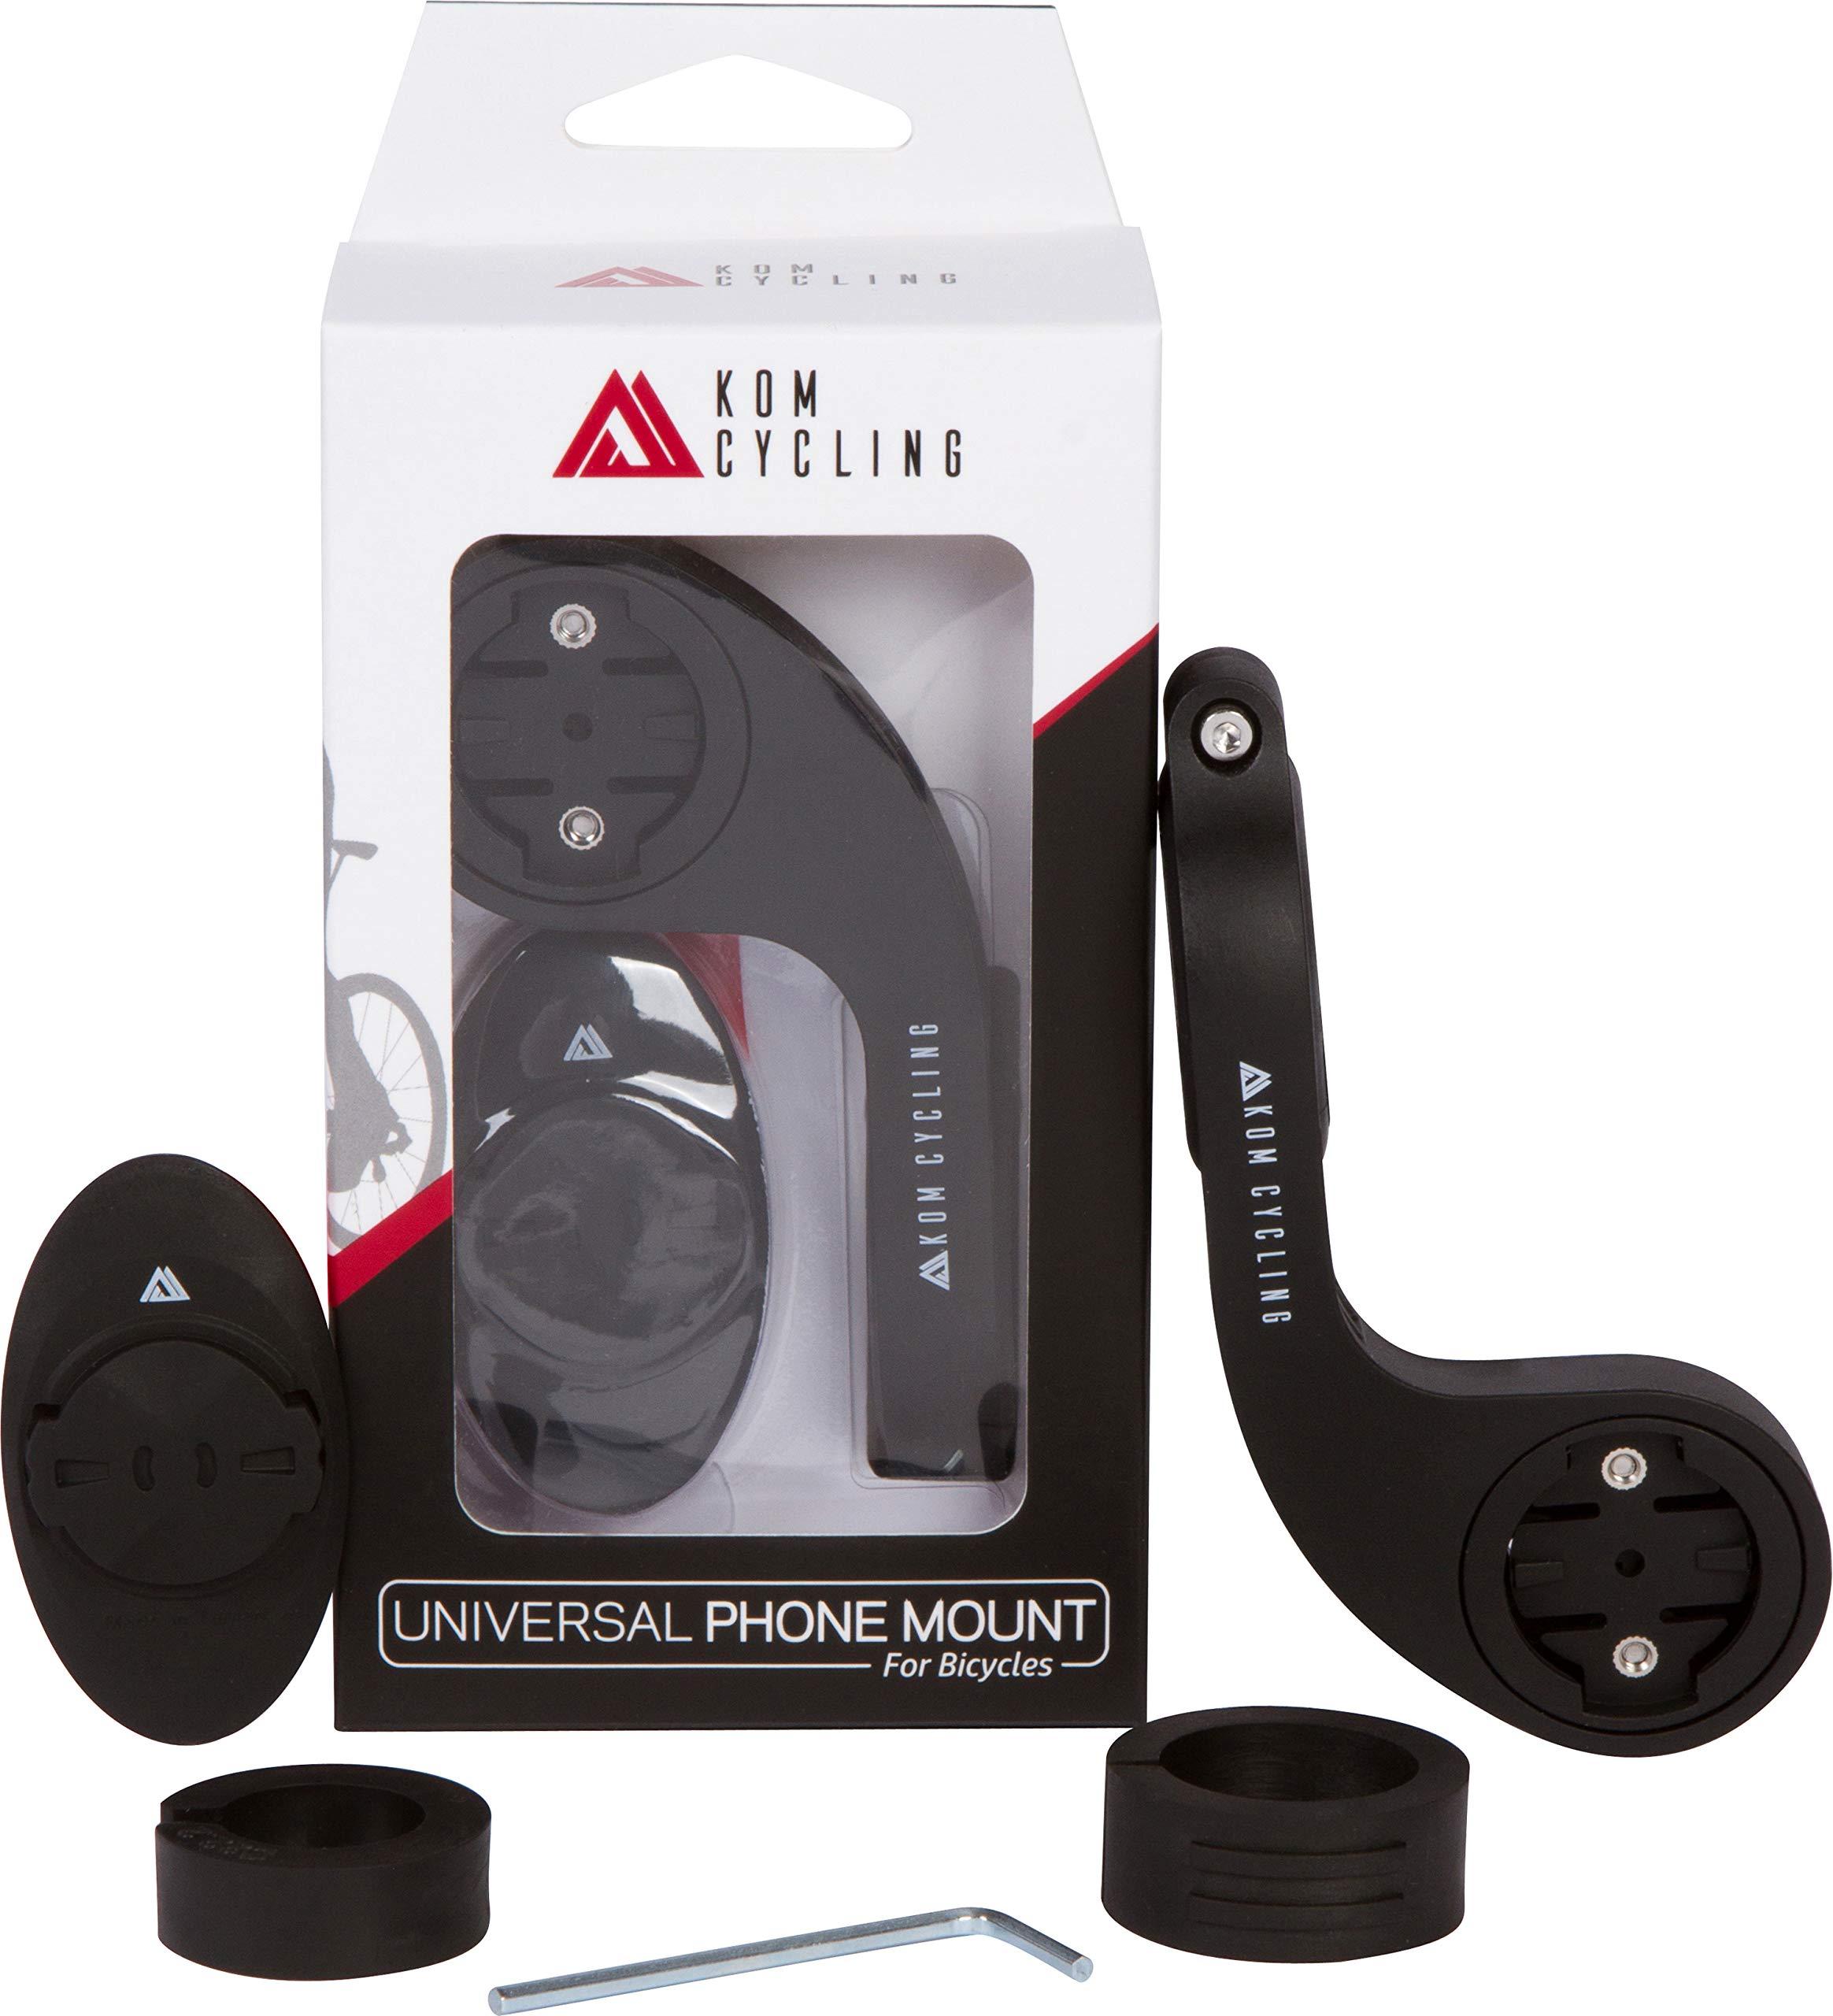 KOM Cycling Garmin Edge Universal Phone Adapter Attach Your Smartphone to Any Garmin Bike Mount - Garmin Quarter Turn Phone Mount Adhesive Adapter ... (Universal Phone Mount Kit)